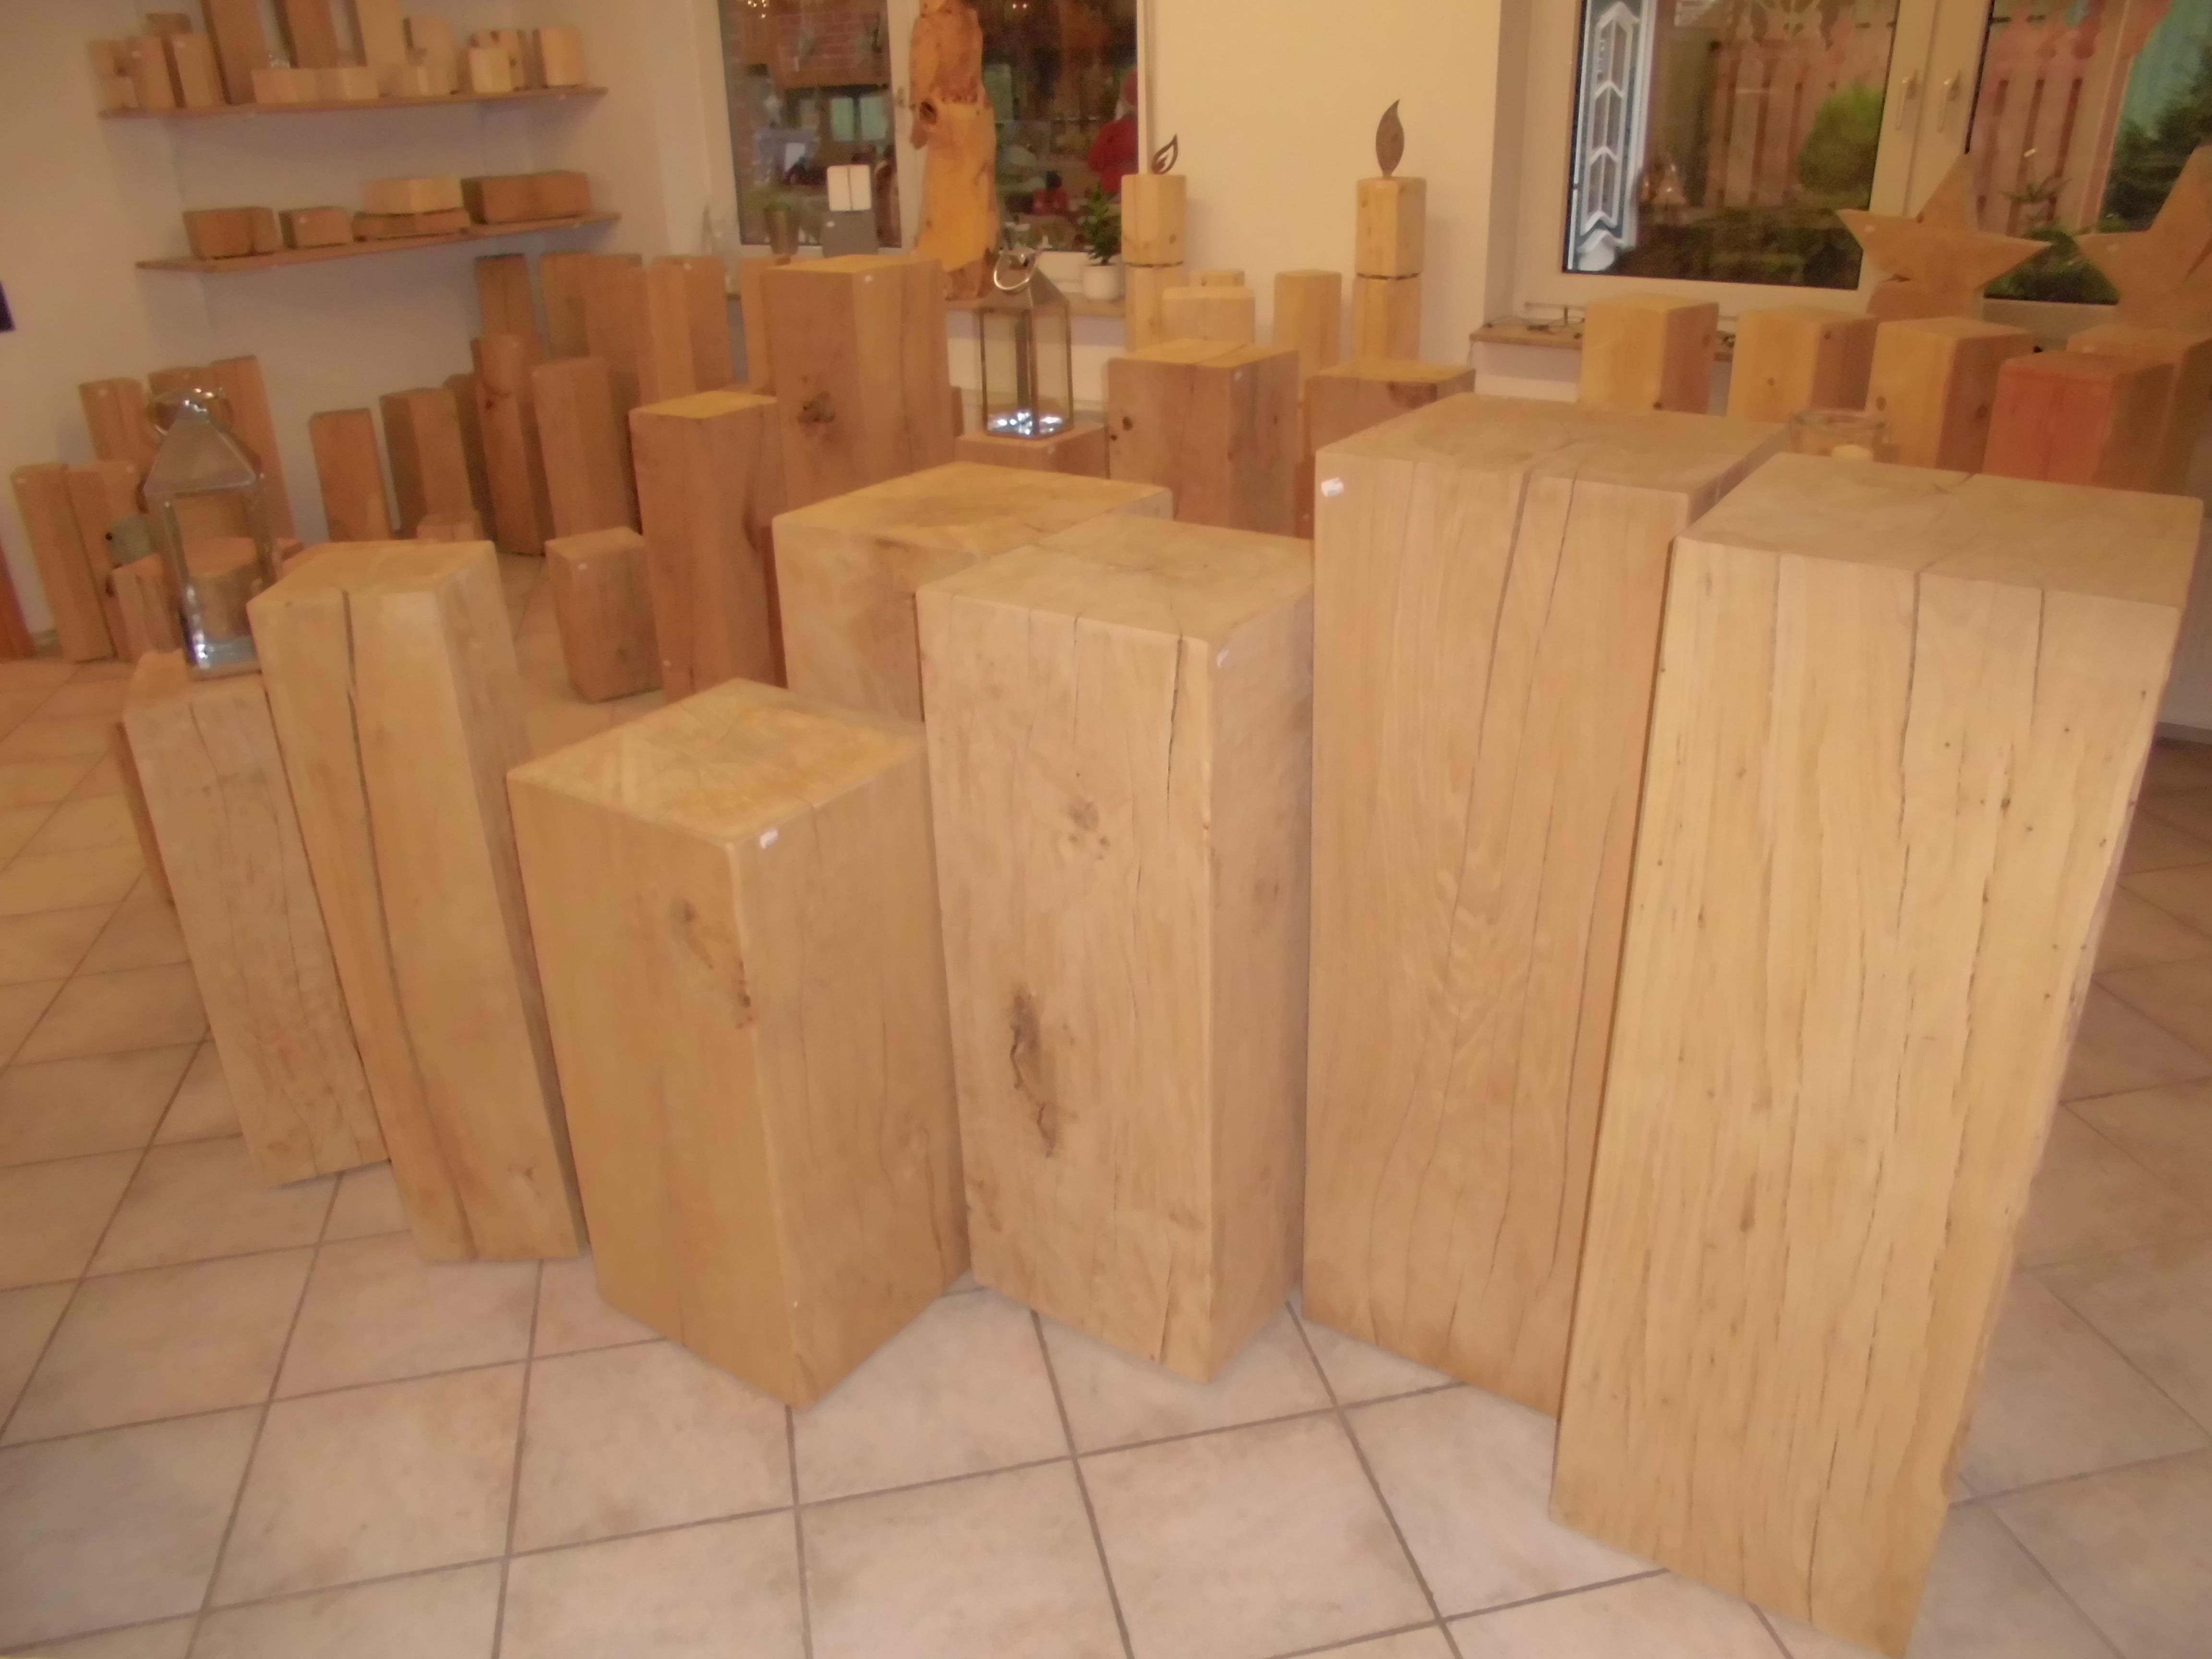 Eichenholzsäule gehobelt, geschliffen, angefast 15x15x40cm